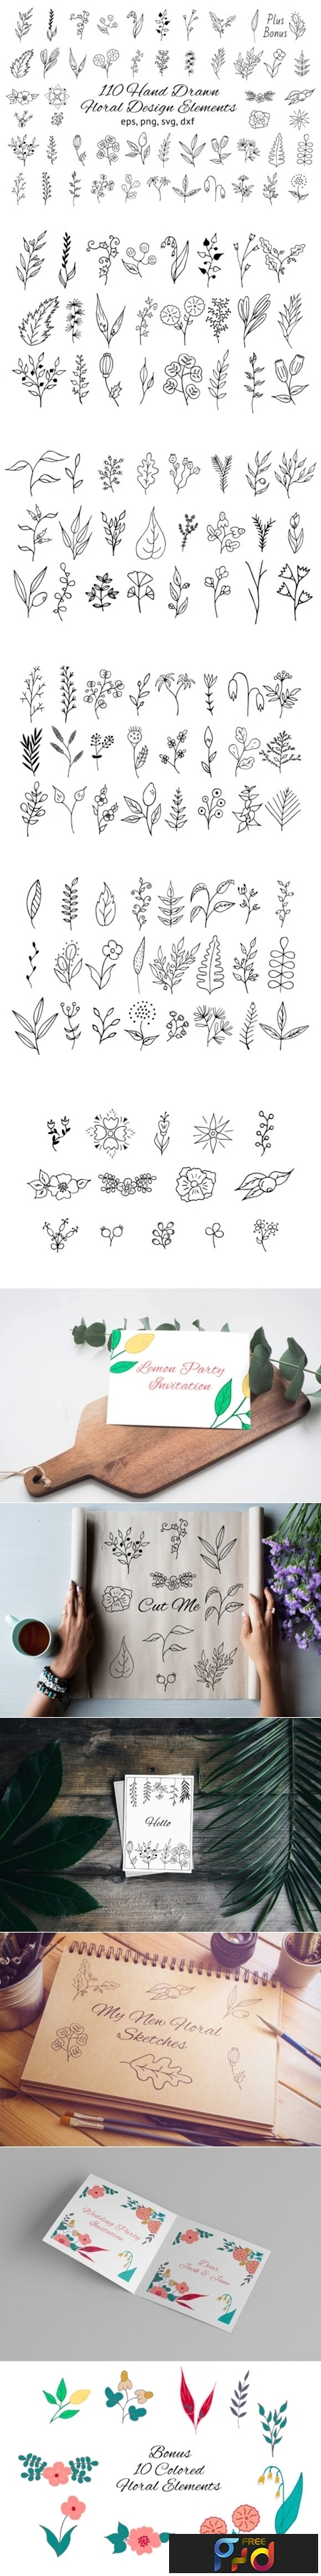 110 Hand drawn Floral Design Elements 1